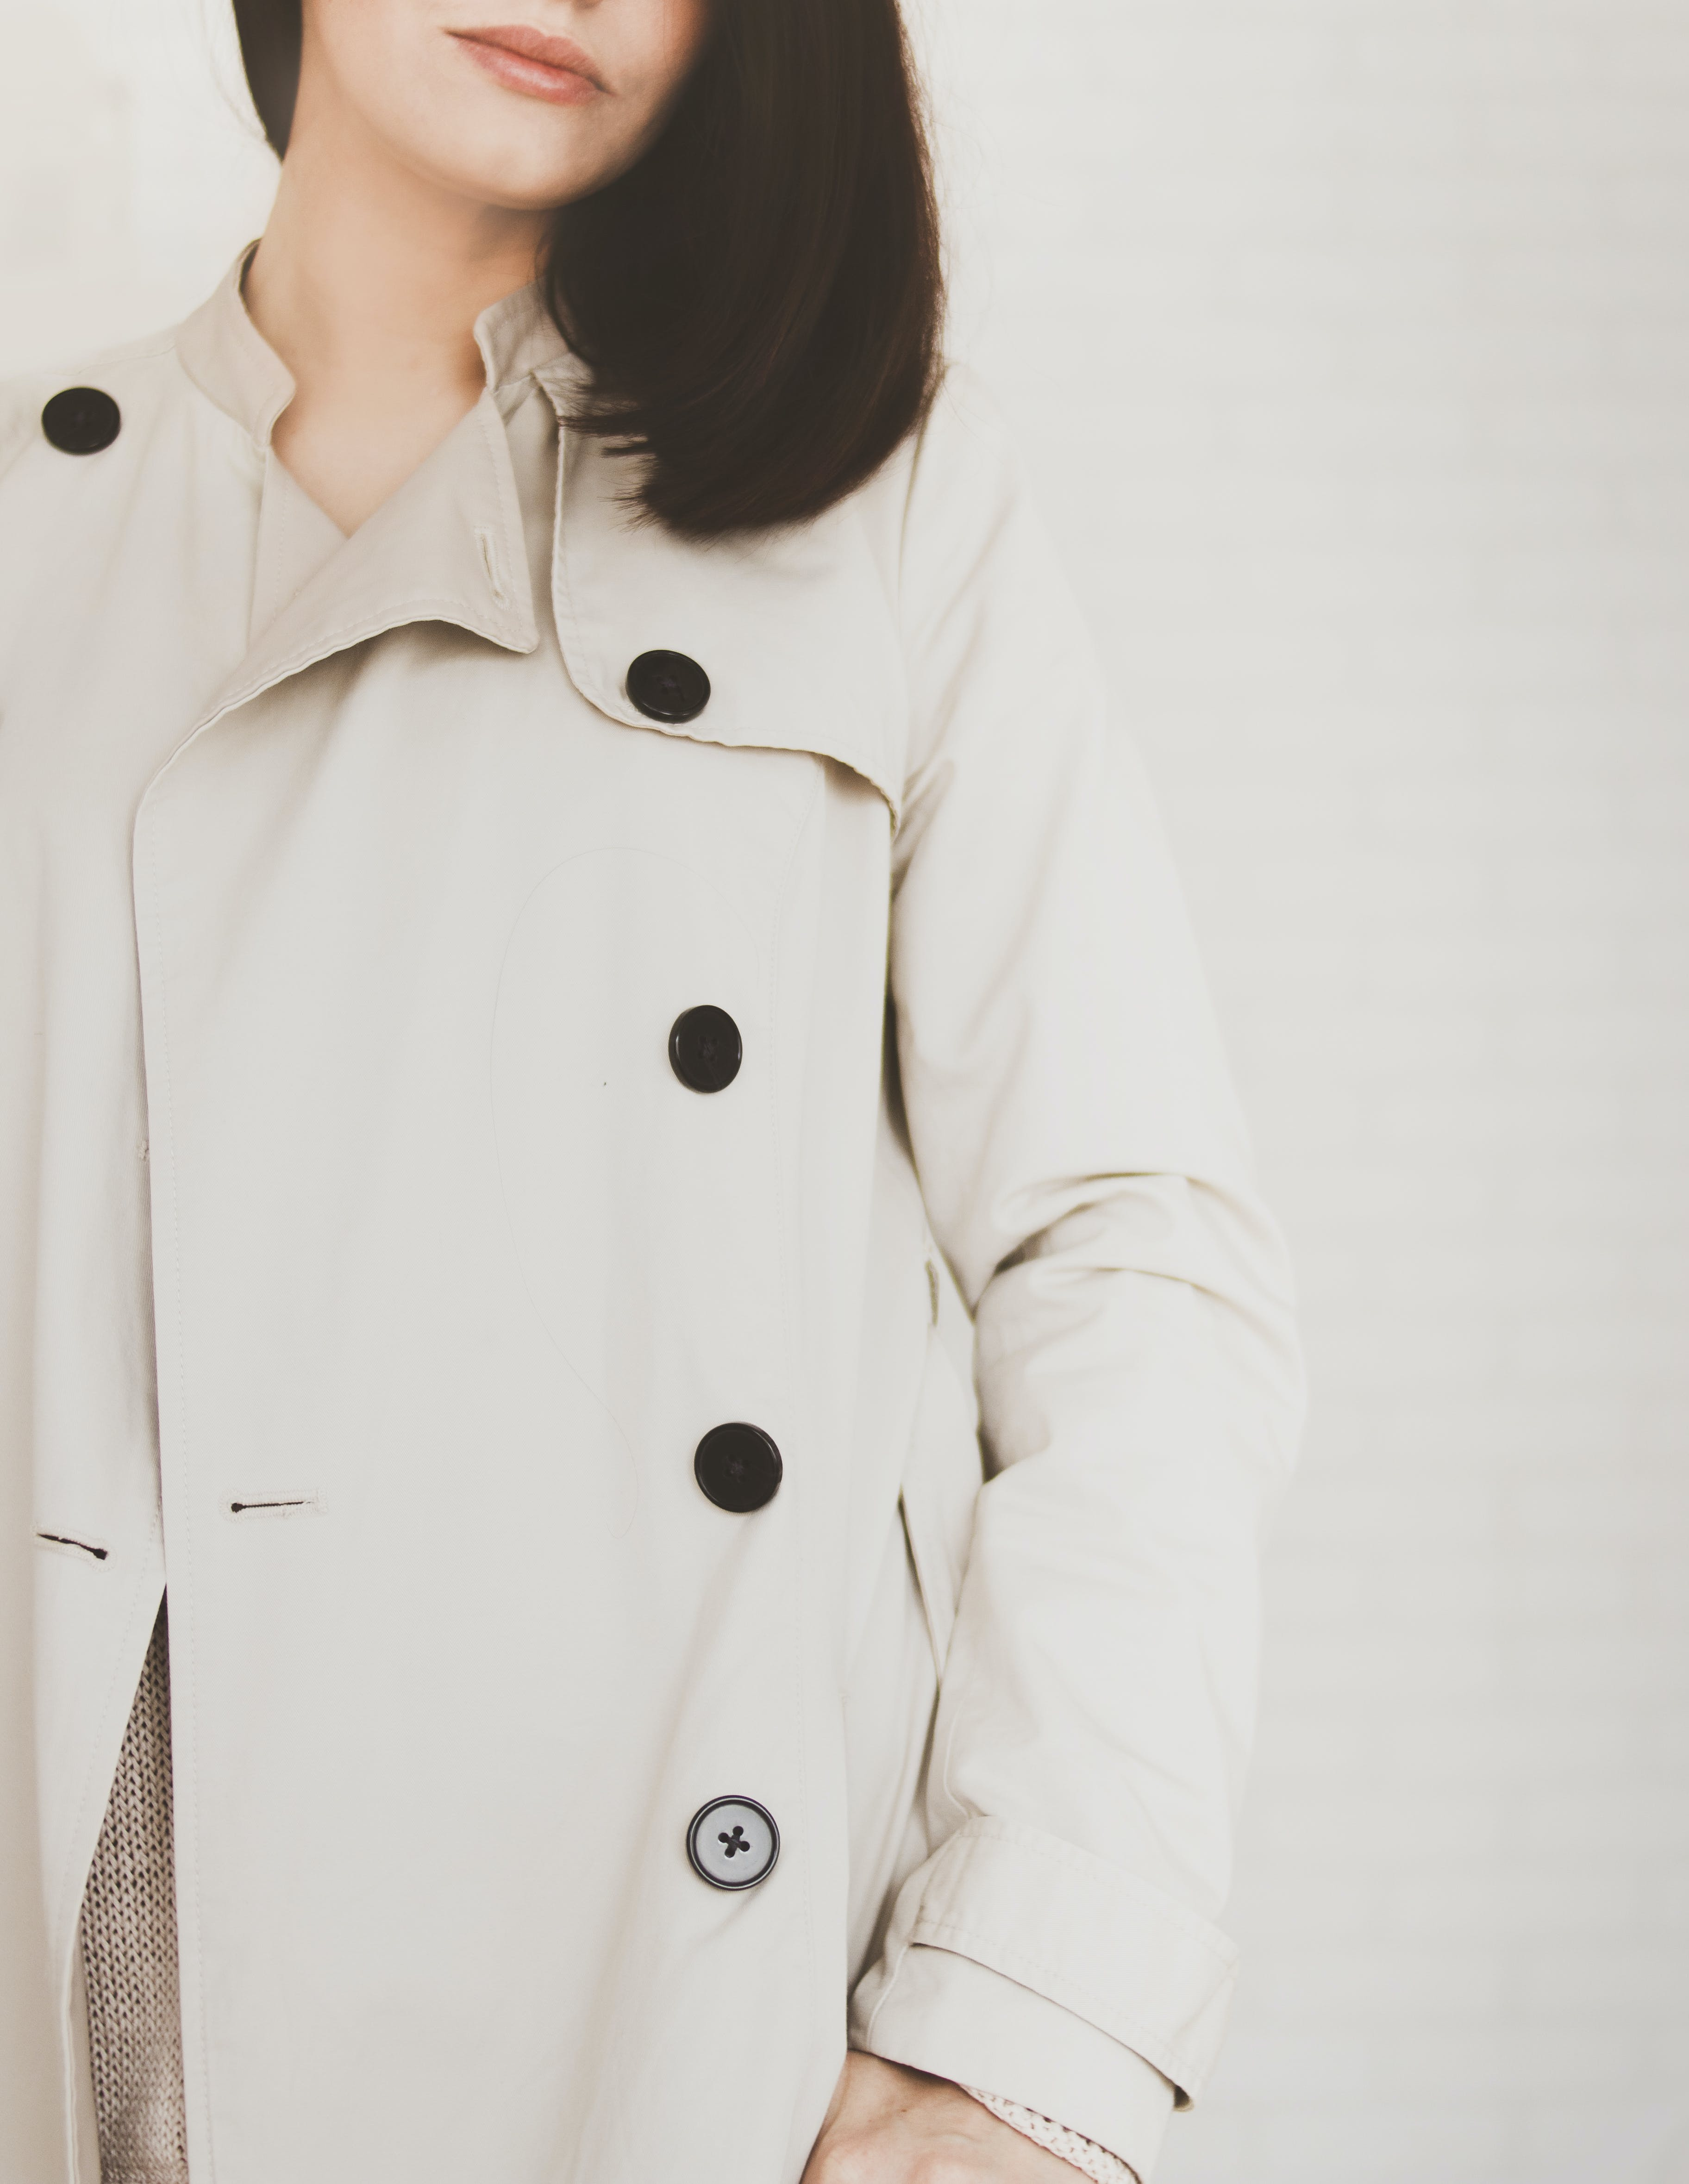 Kostenloses Stock Foto zu dame, drinnen, fashion, fotoshooting